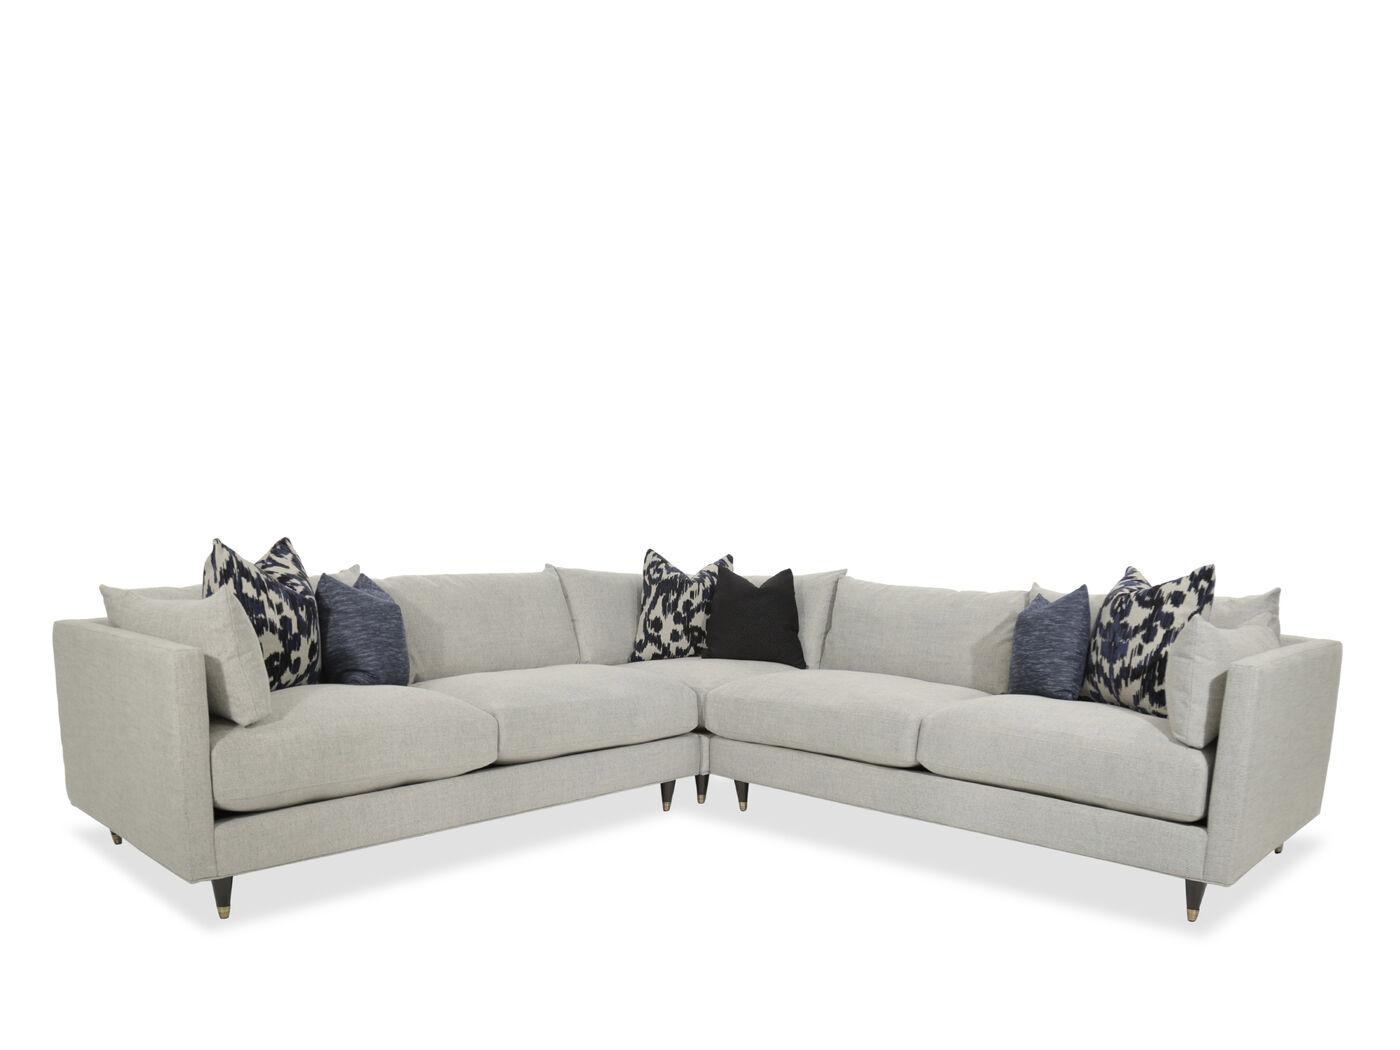 Jonathan Louis Sectional Sofa Reviews Refil Sofa